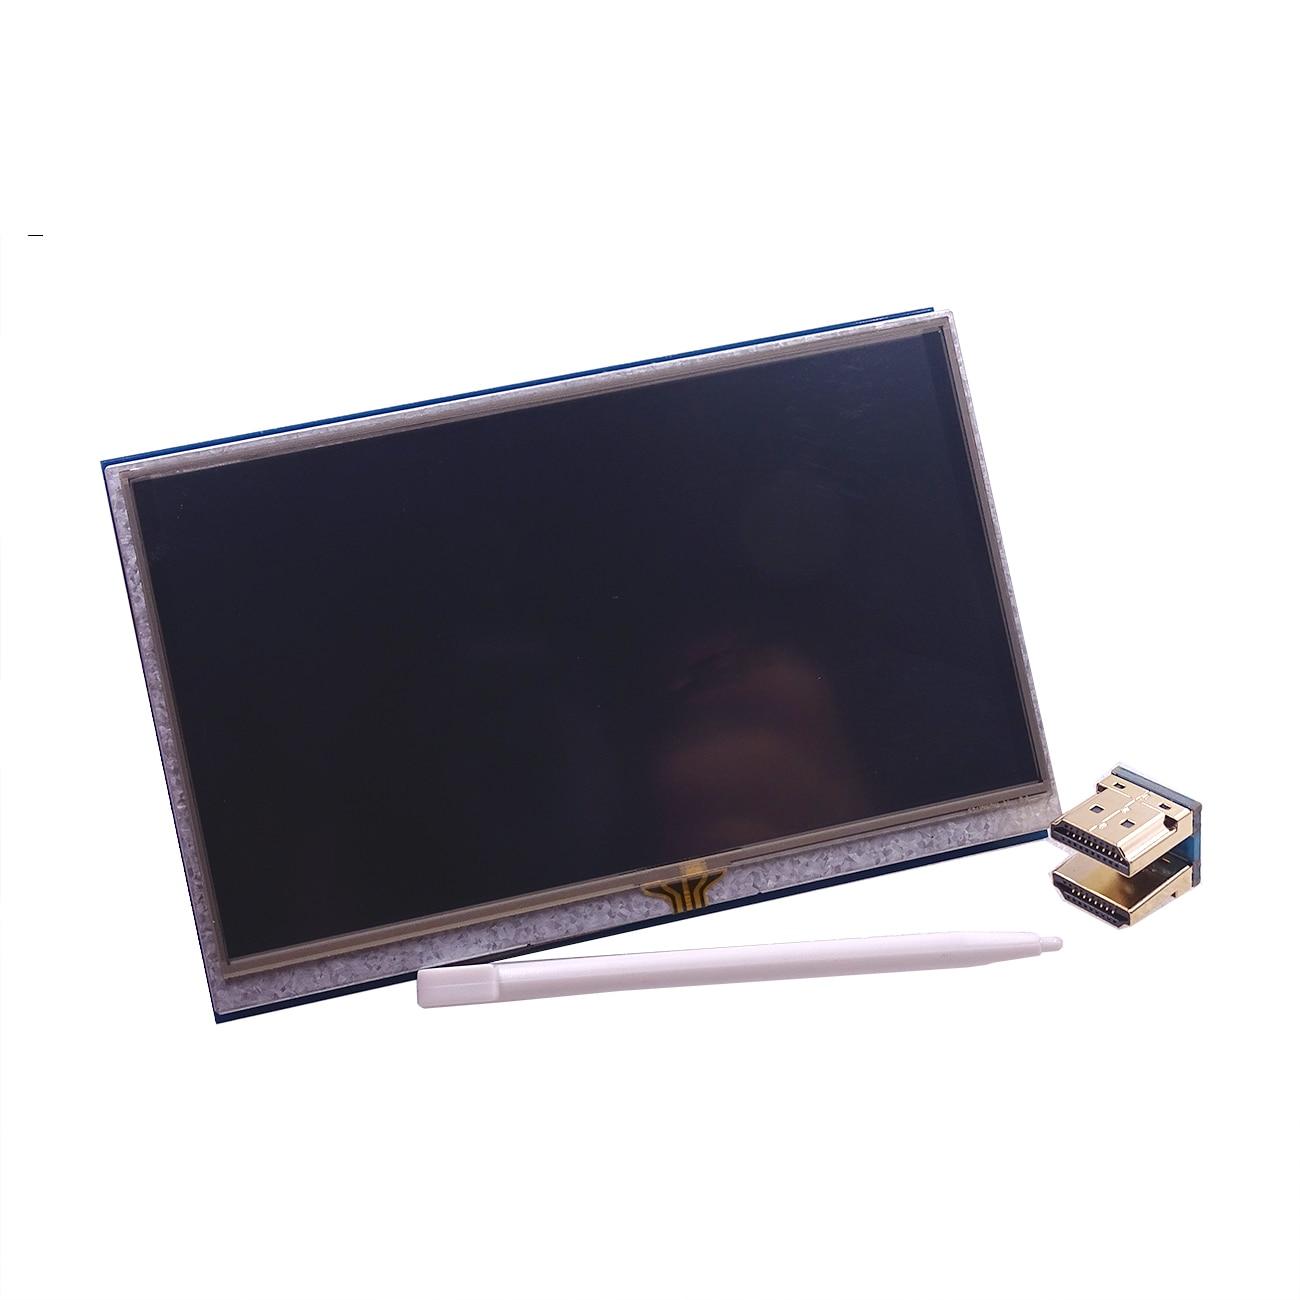 "A2TD A 5/"" 800x480 HDMI Touch LCD Screen Display Für Raspberry Pi Pi2 Model B"